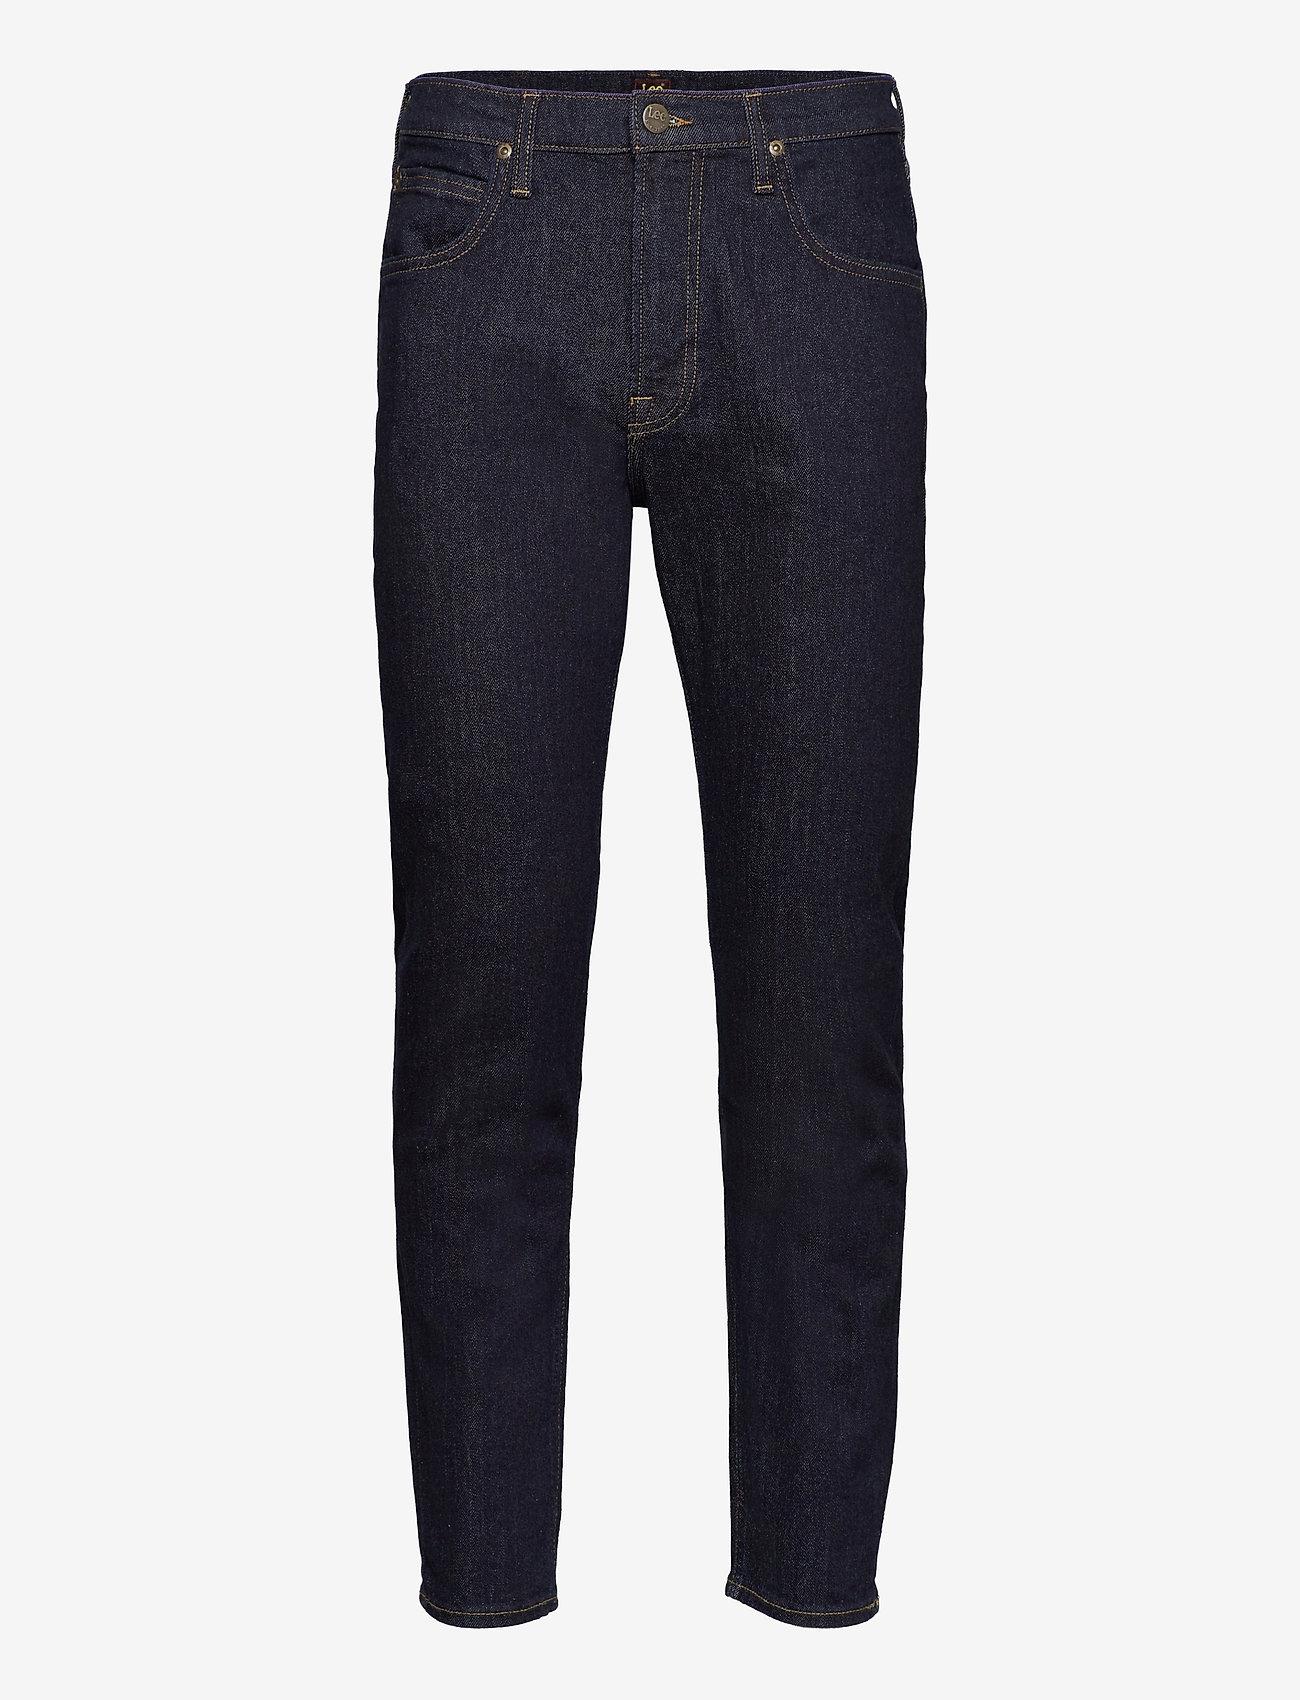 Lee Jeans - AUSTIN - regular jeans - rinse - 0